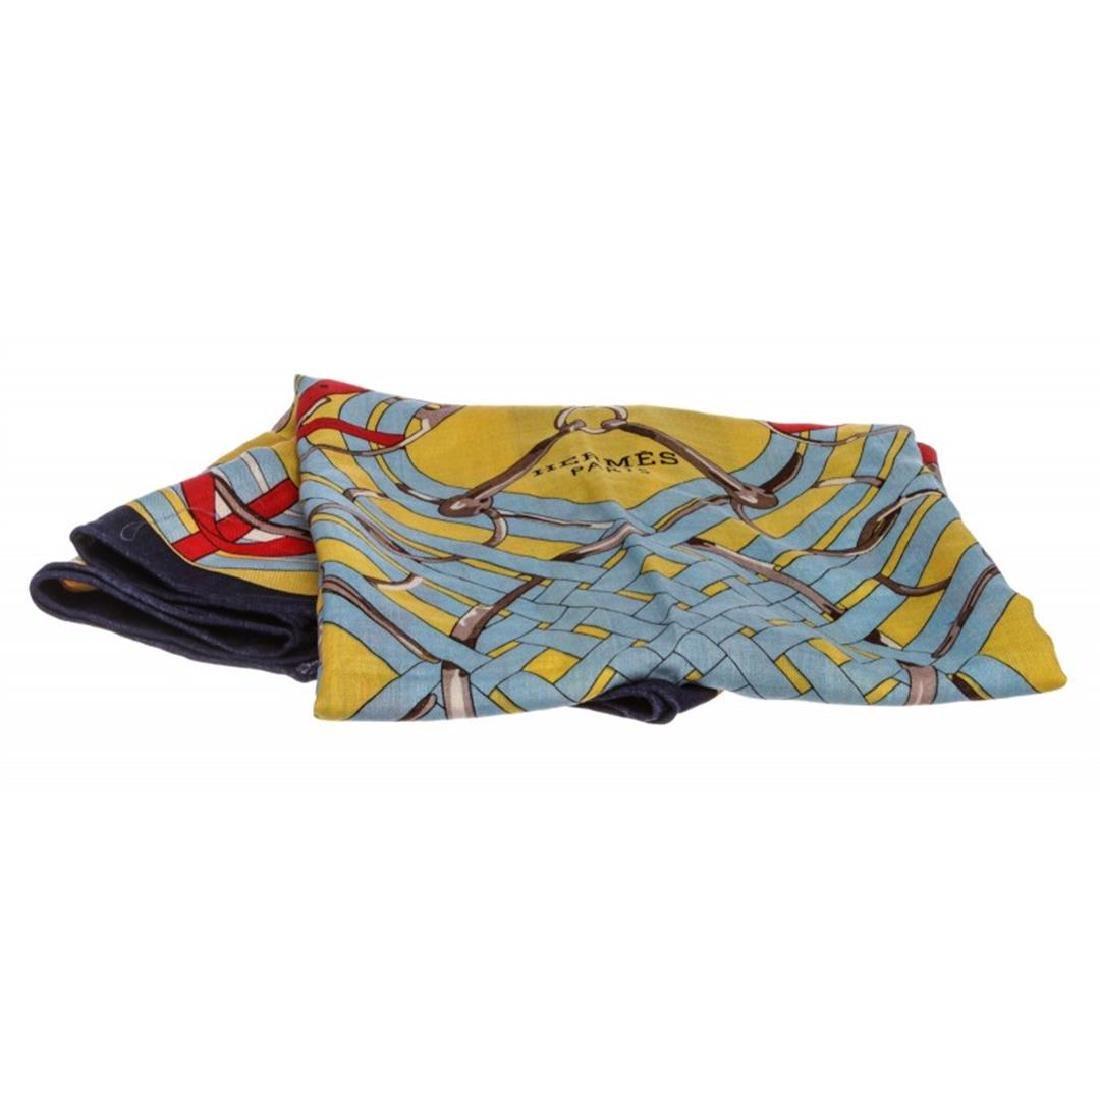 Hermes Yellow Multicolor Gener Peris Print Scarf